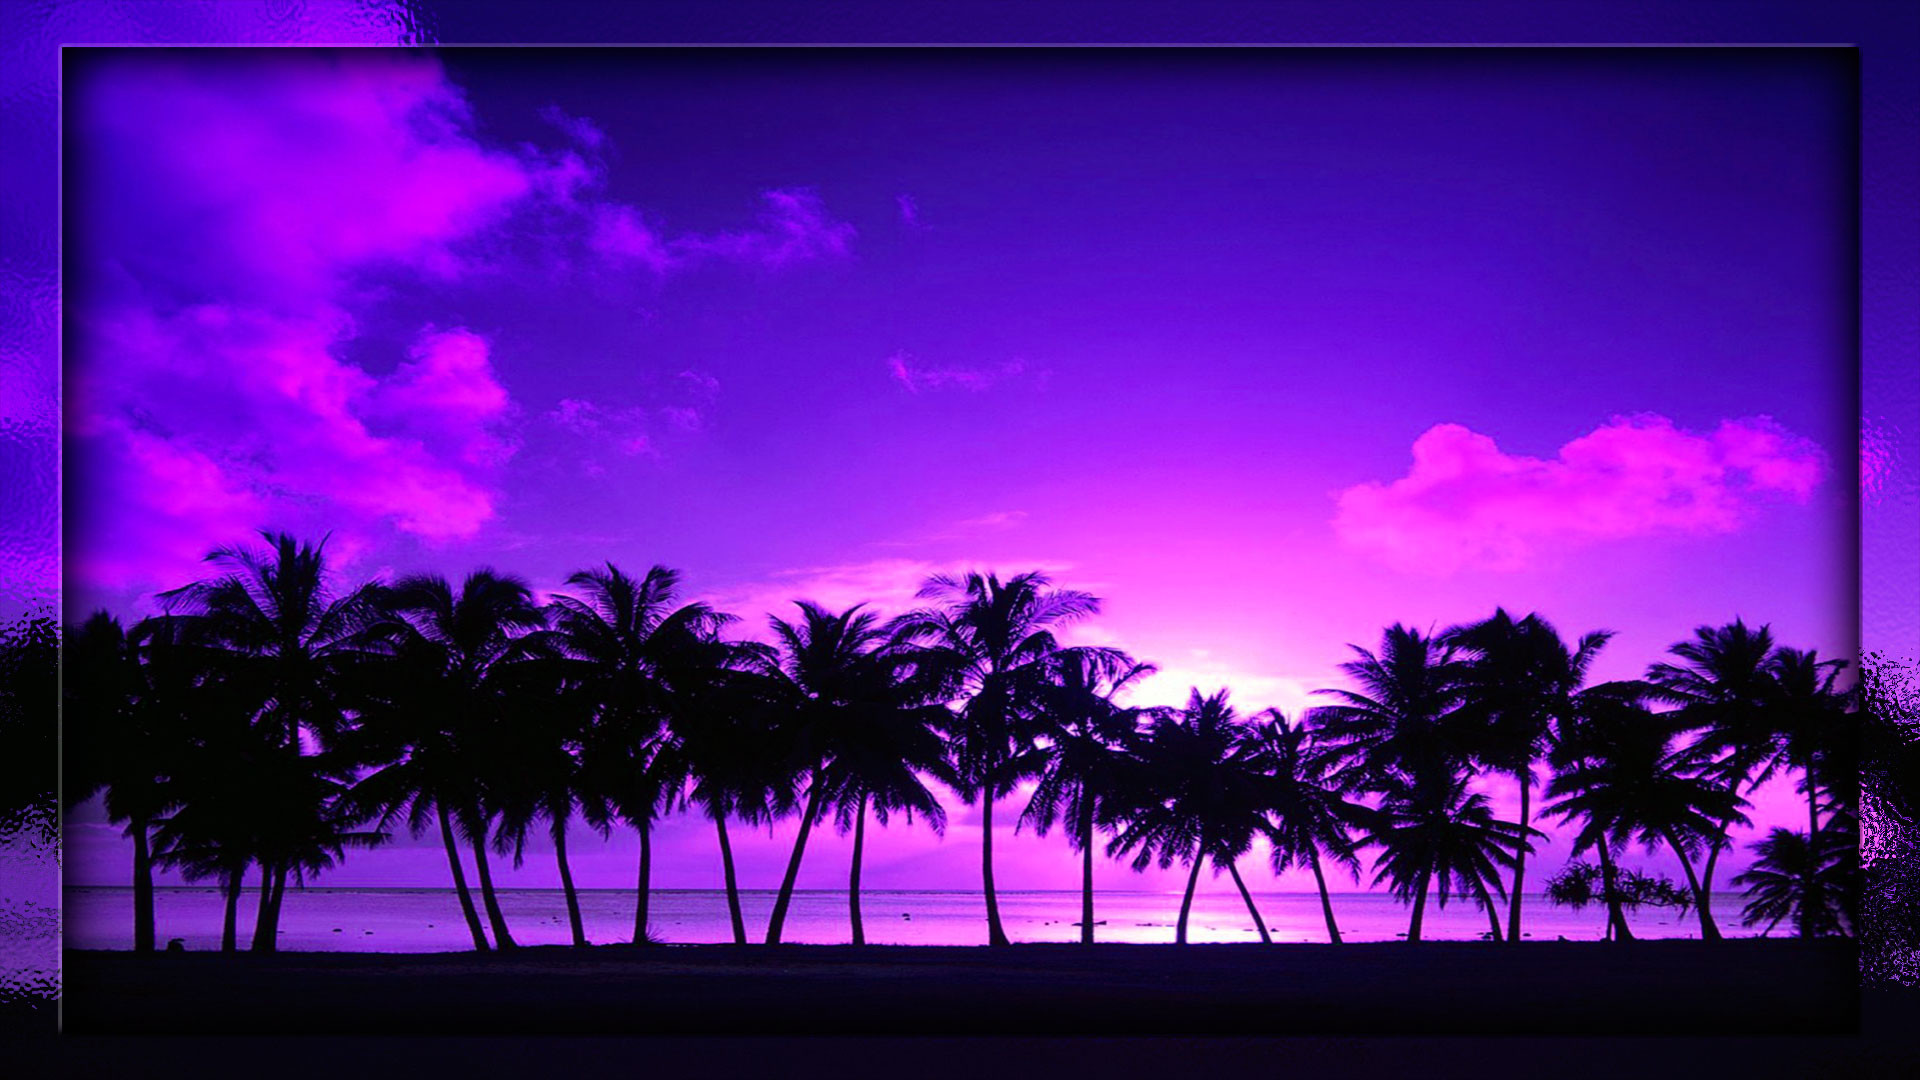 BEACH SUNSET PALM TREE WALLPAPER